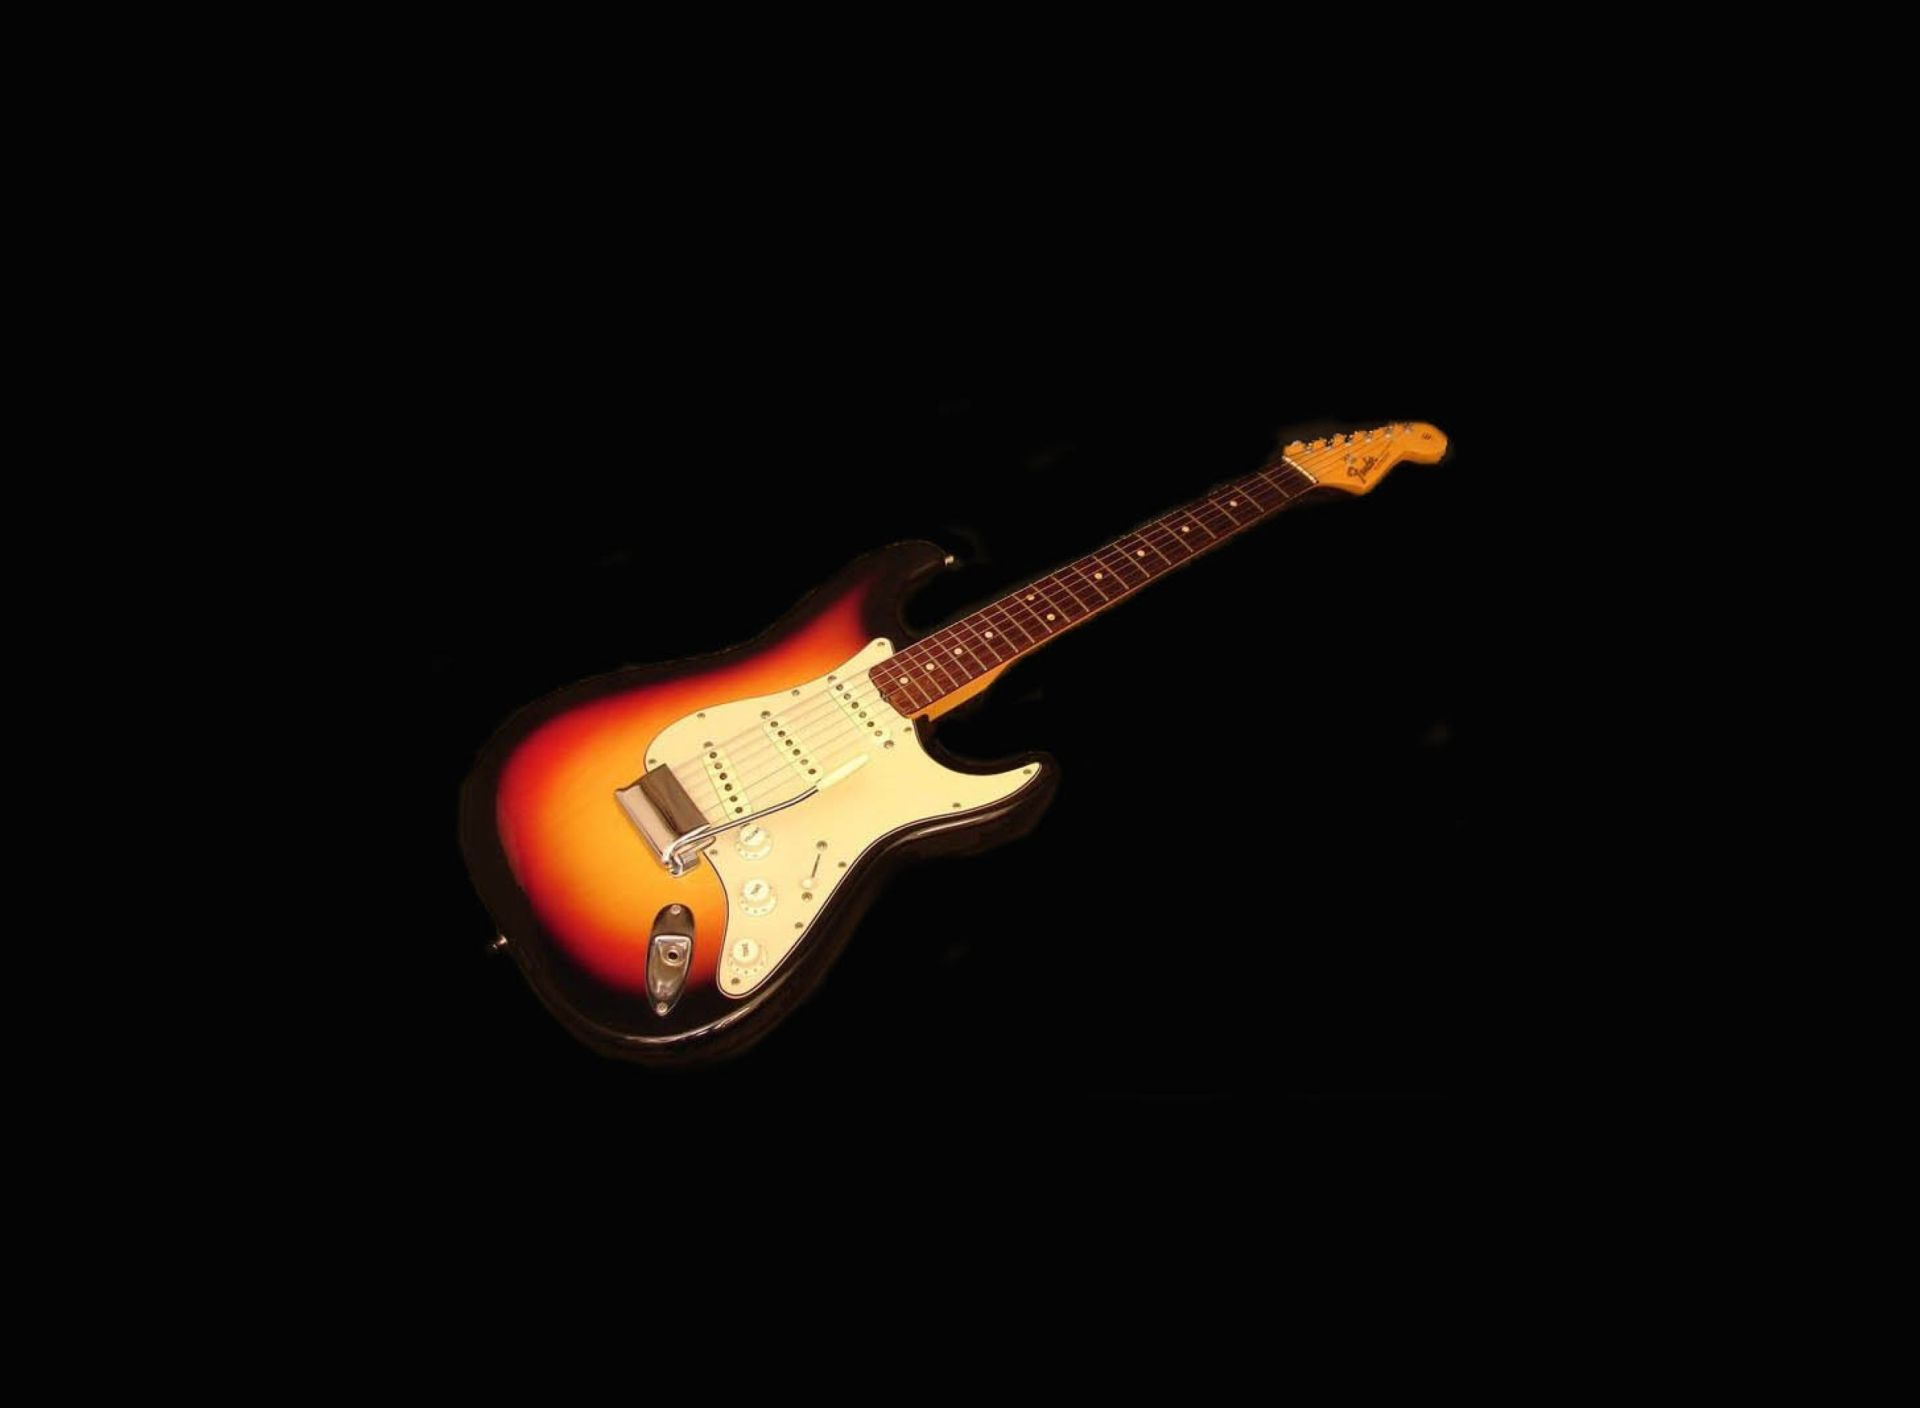 Fender Guitar, Wallpaper